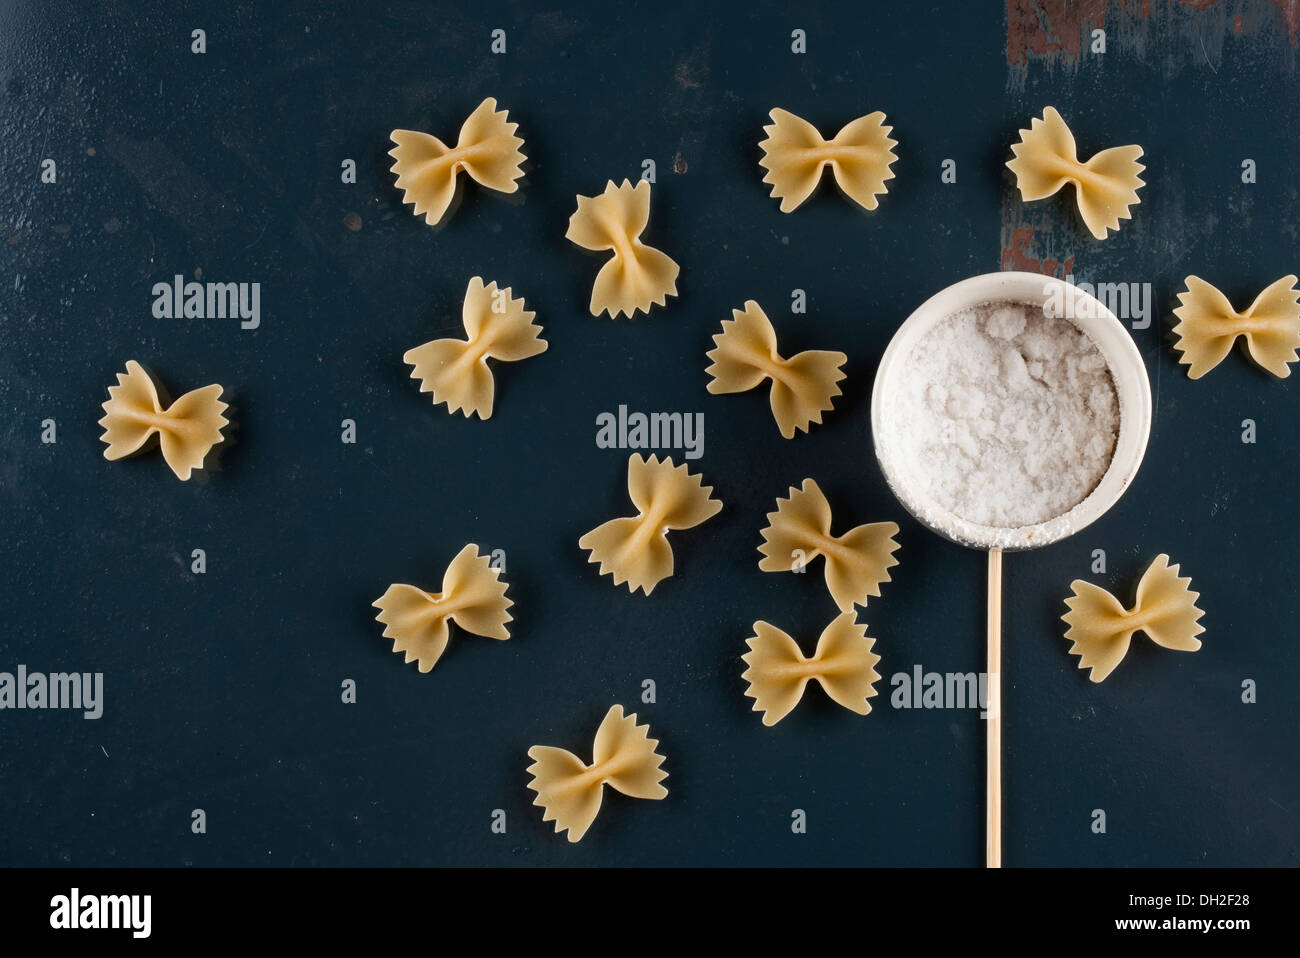 Farfalle pasta, concept of butterflies around a flower - Stock Image